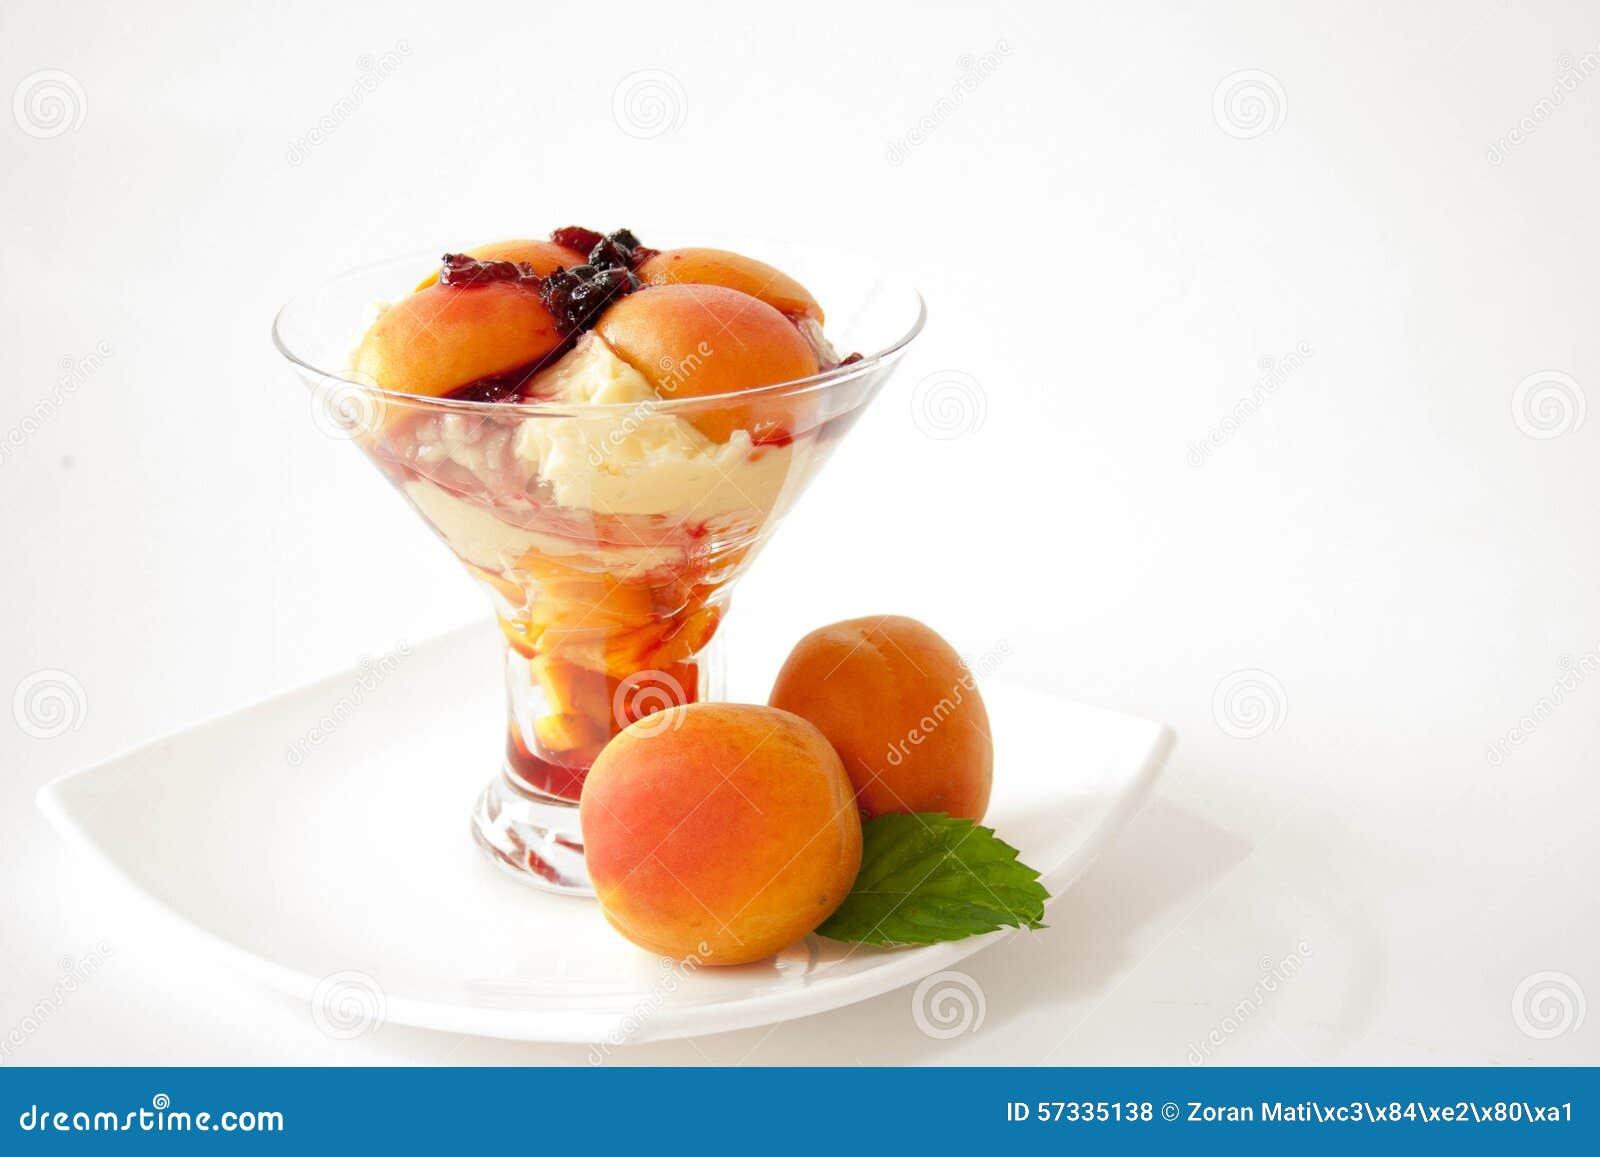 Macédoine de fruits délicieuse